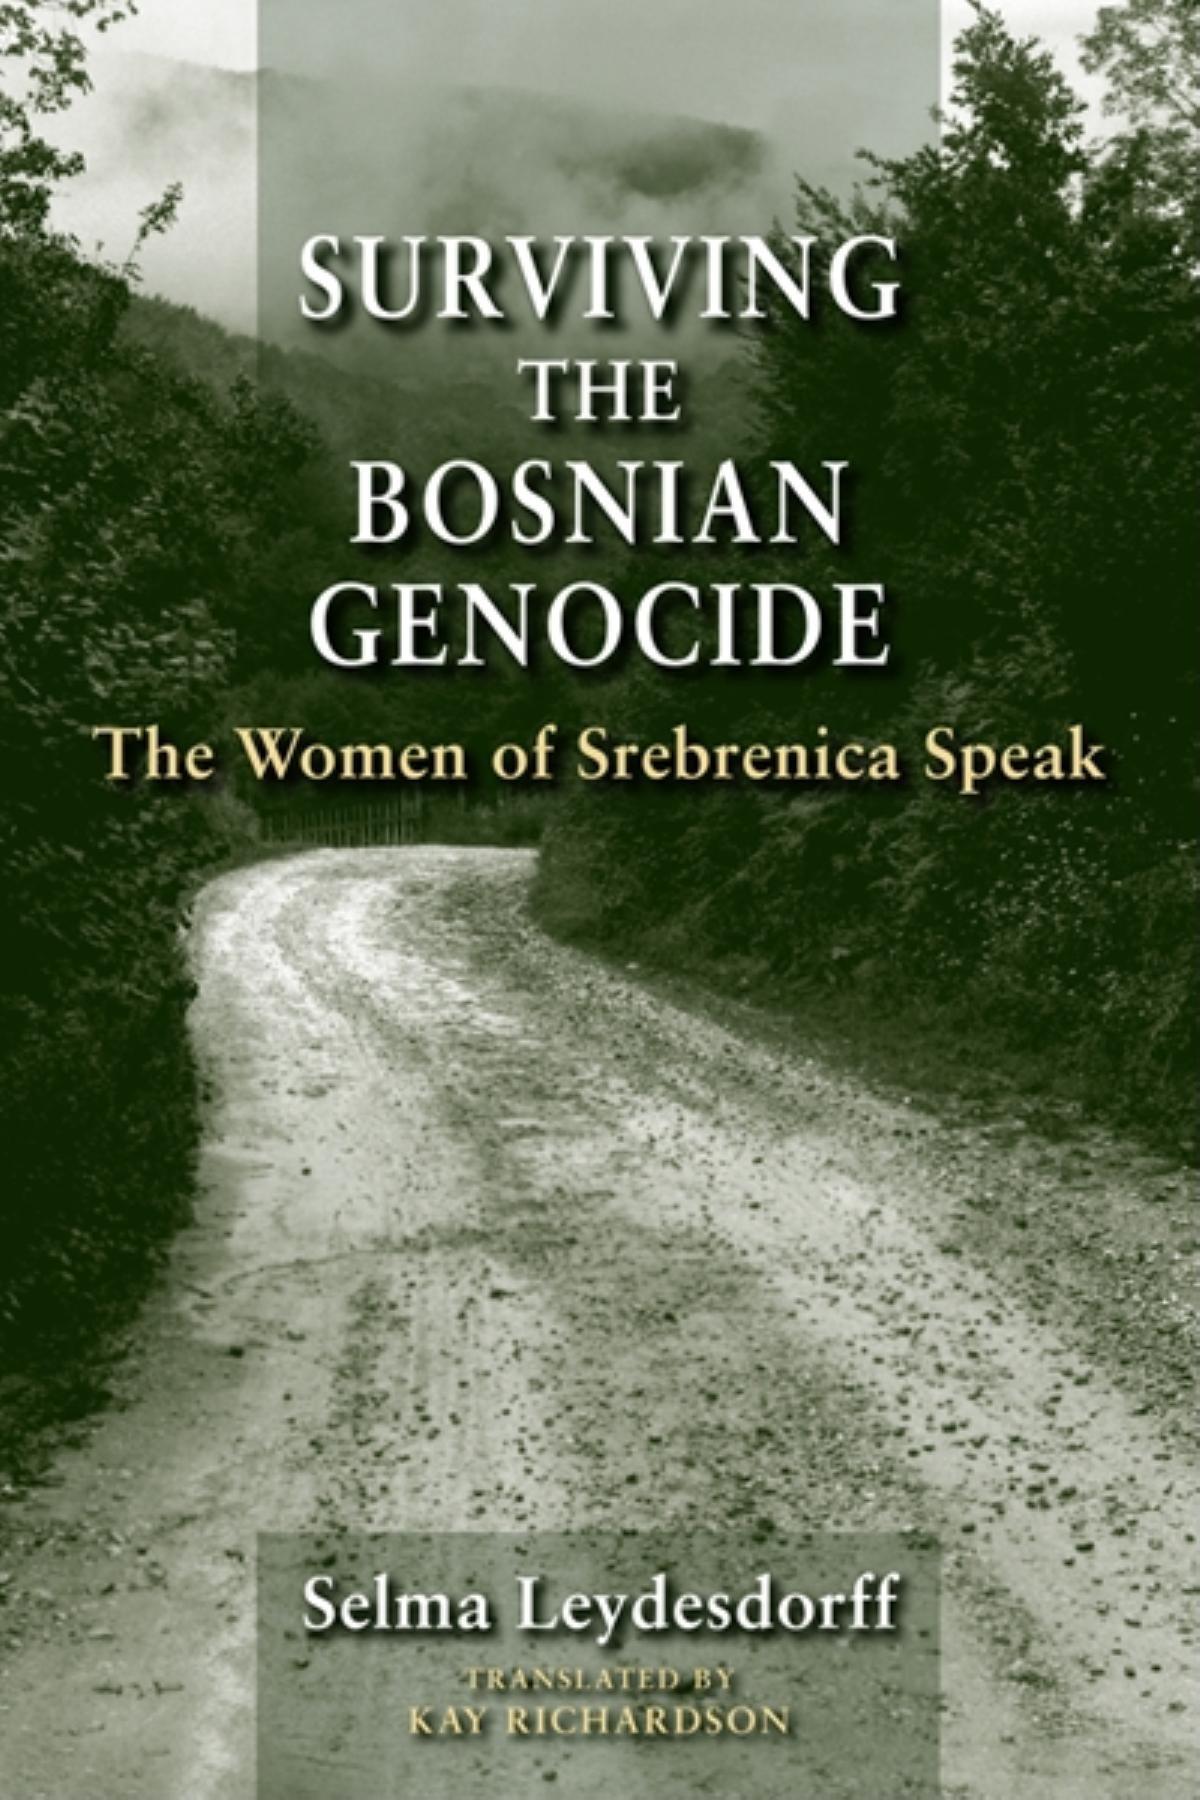 prada shoes made in bosnia herzegovina genocide timeline